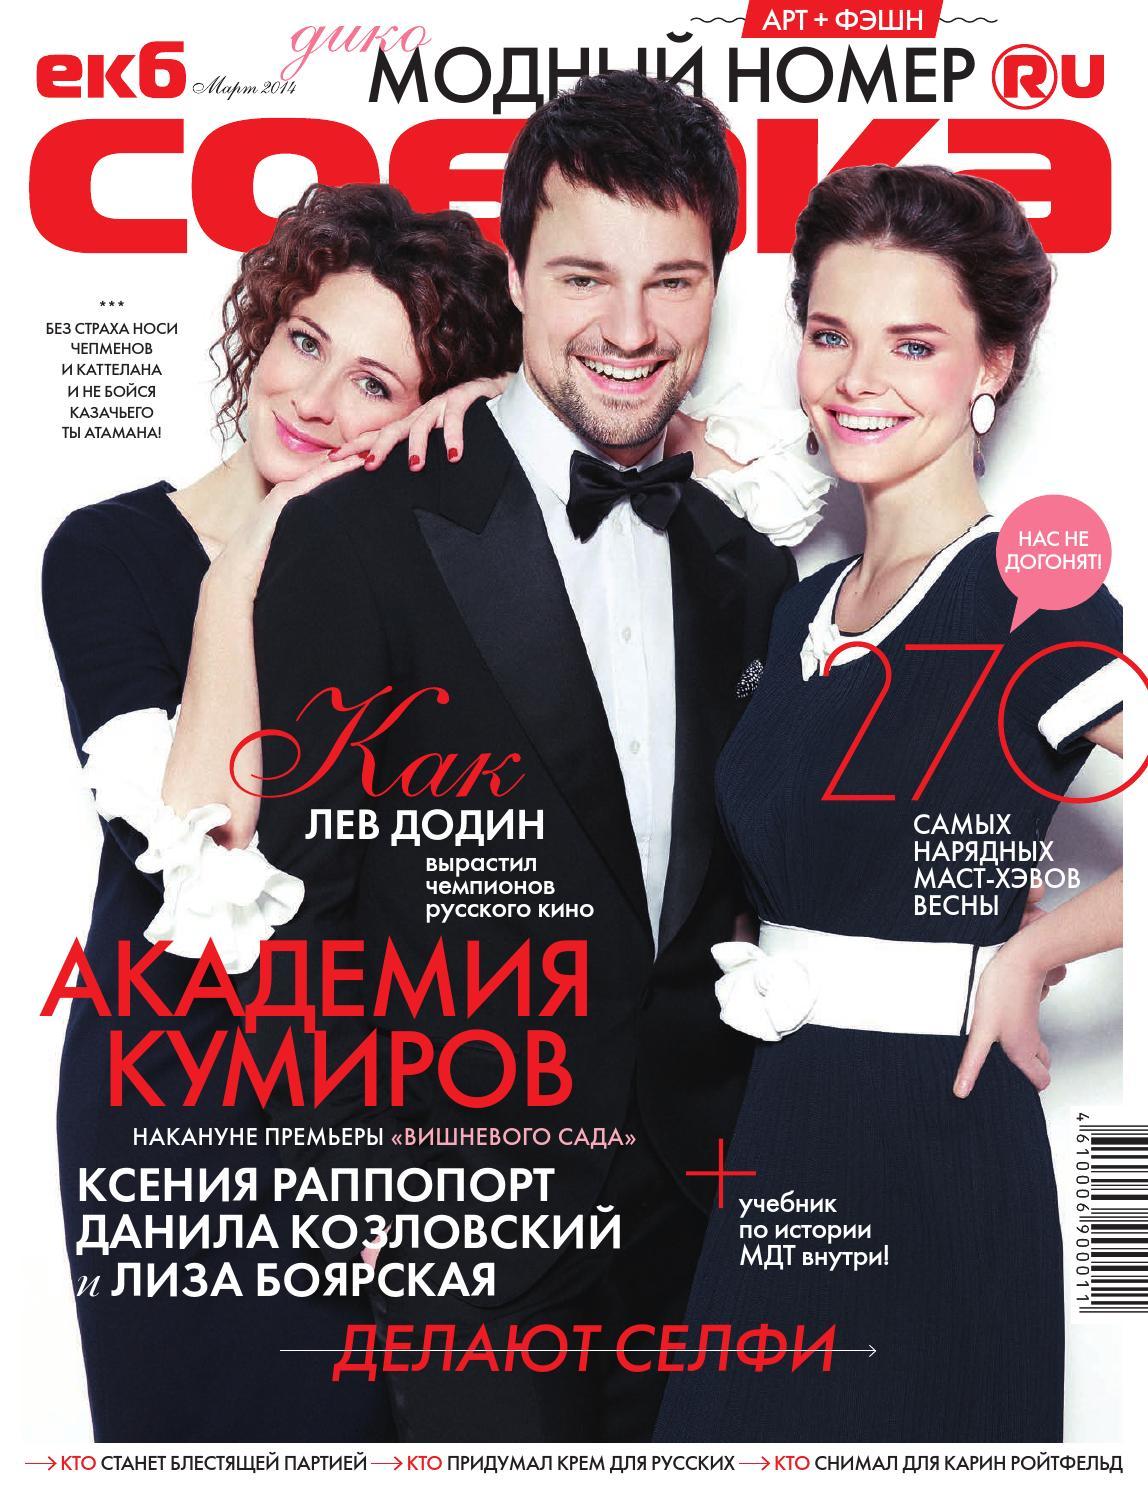 ЕКБ.Собака.ru   март 2014 by екб.собака.ru - issuu f1baae1208b